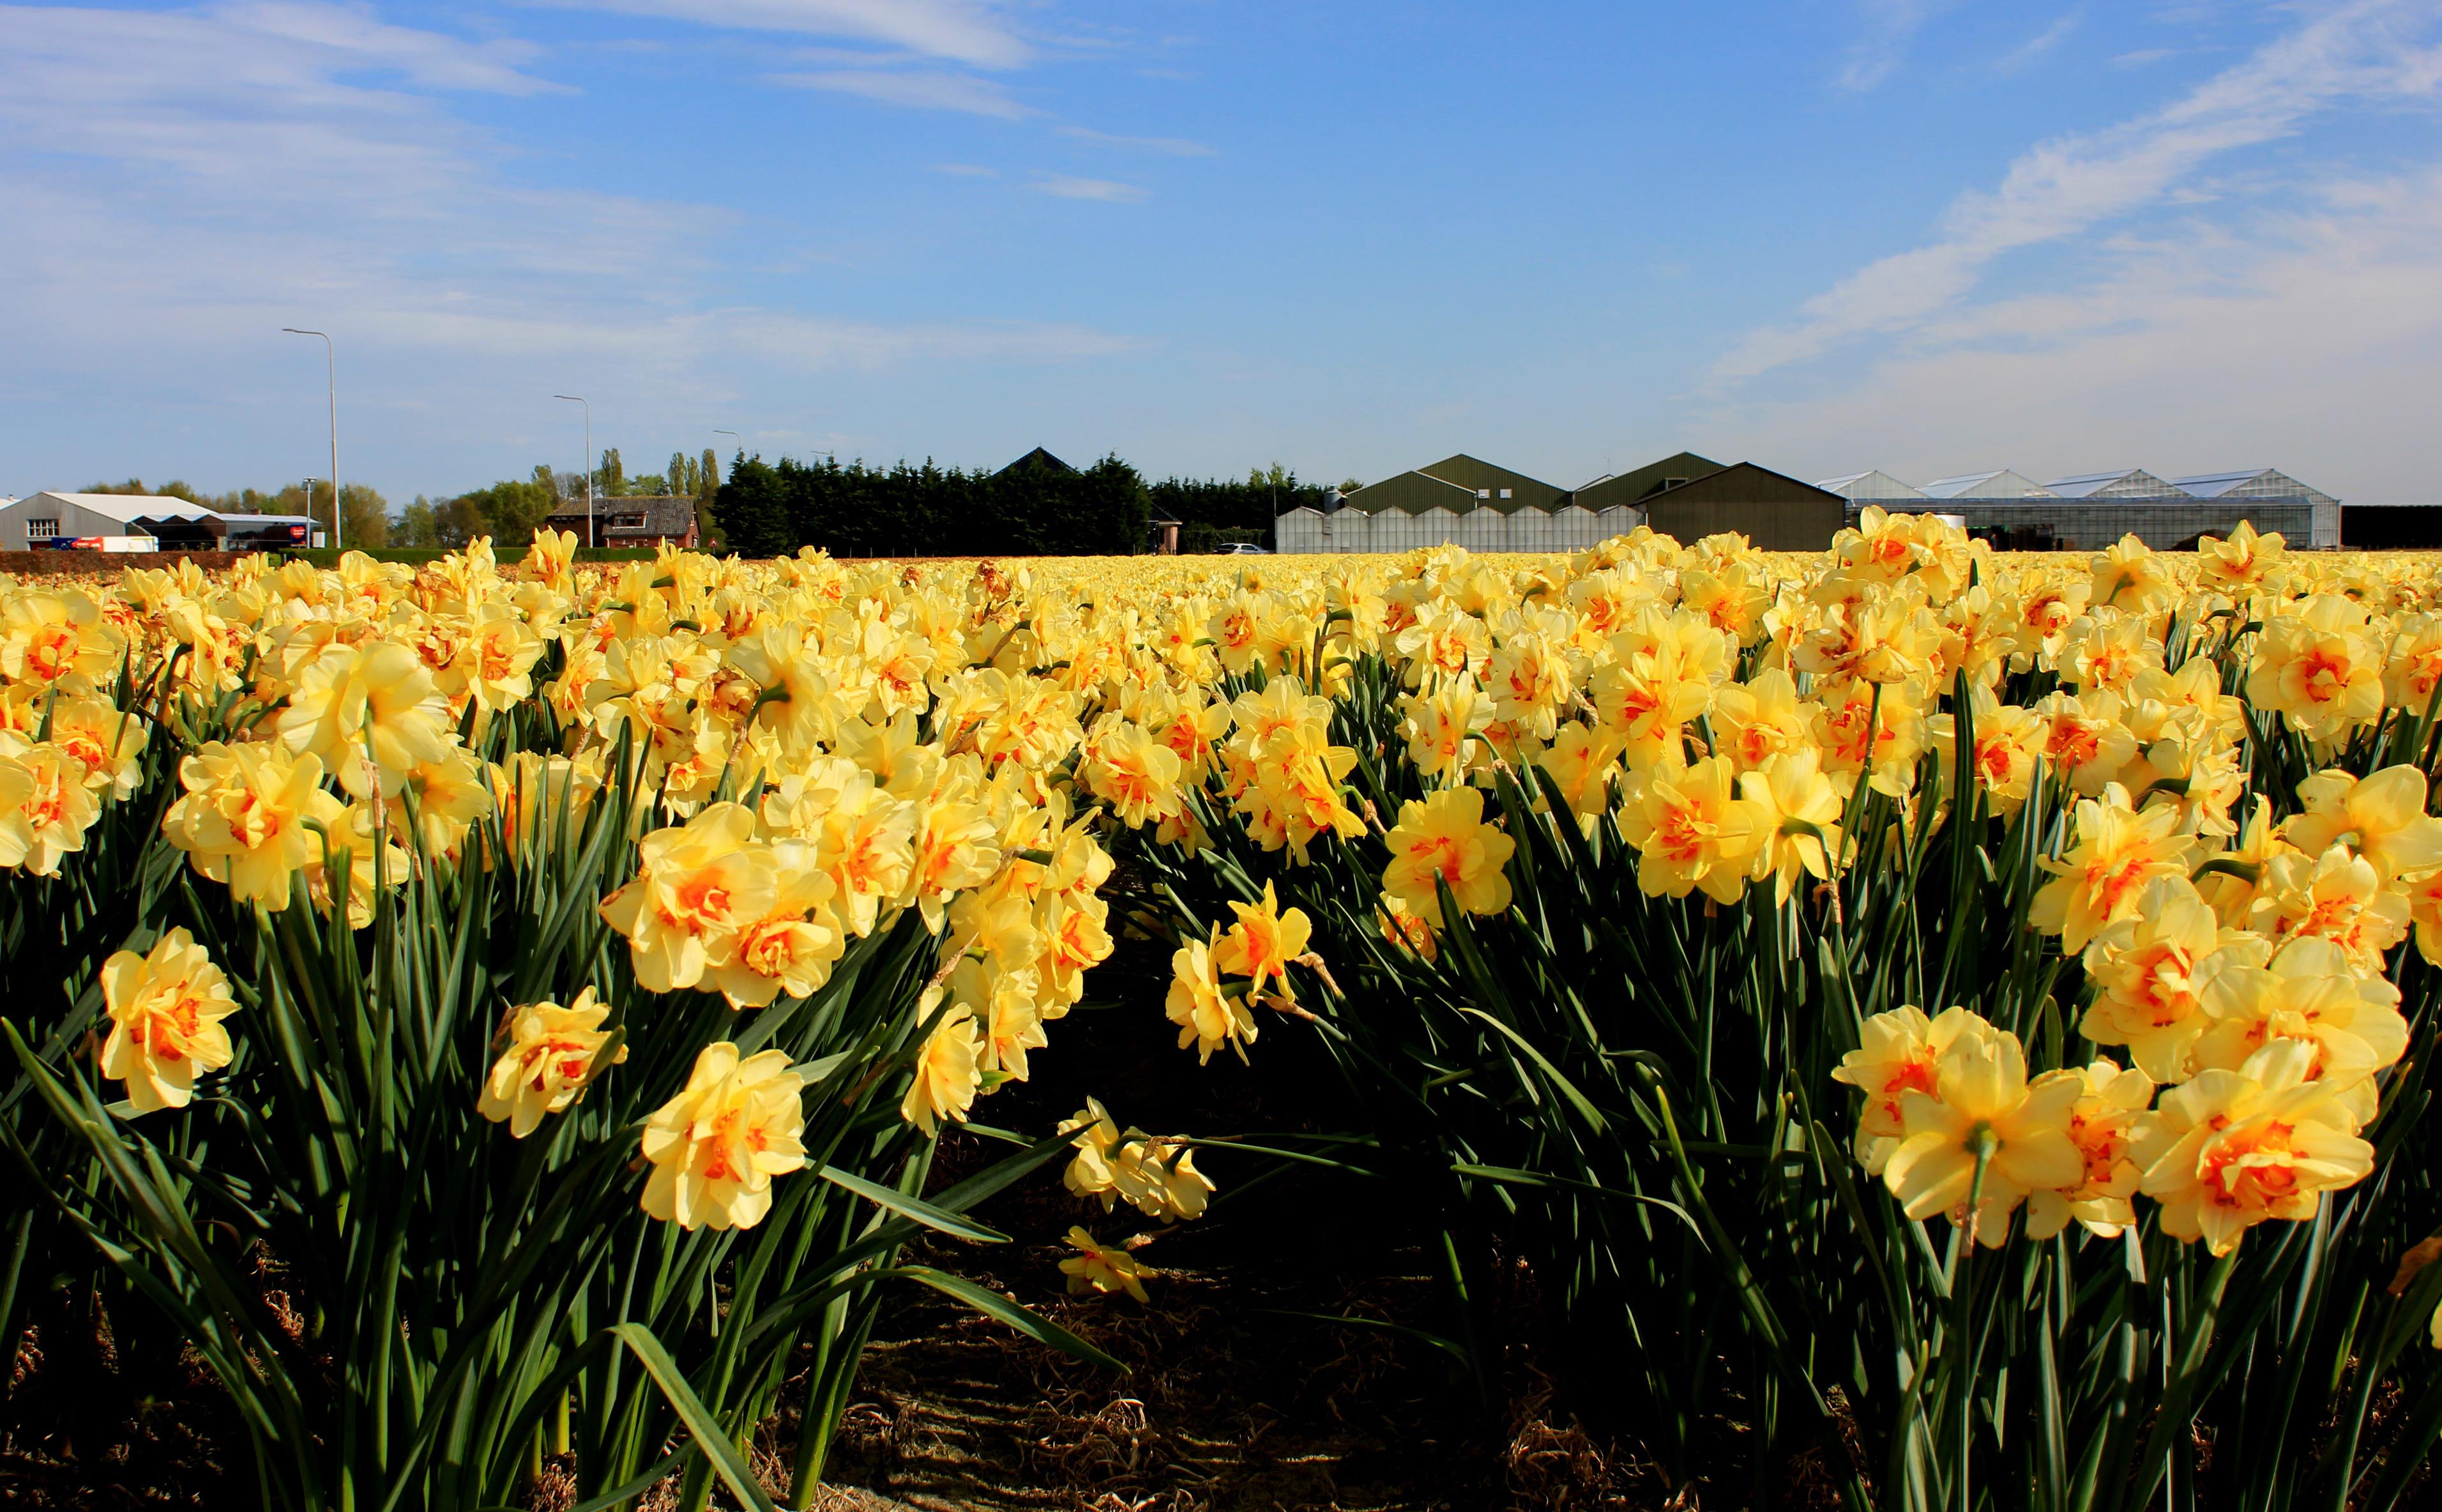 daffodils-photo-91